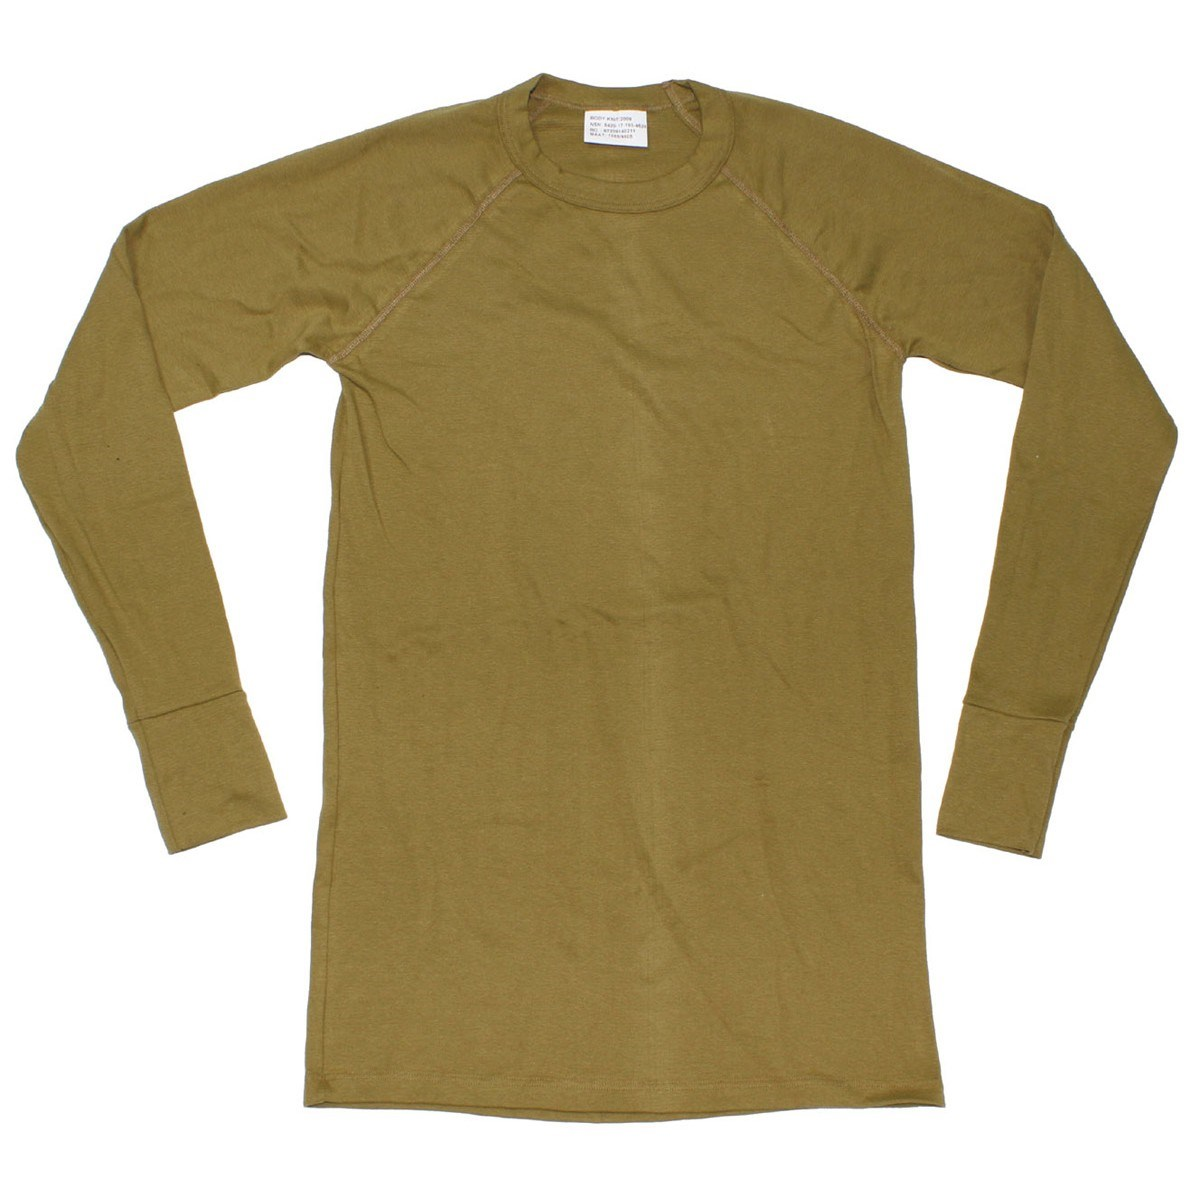 Dutch long sleeve shirt BROWN used Dutch Army 91123100 L-11